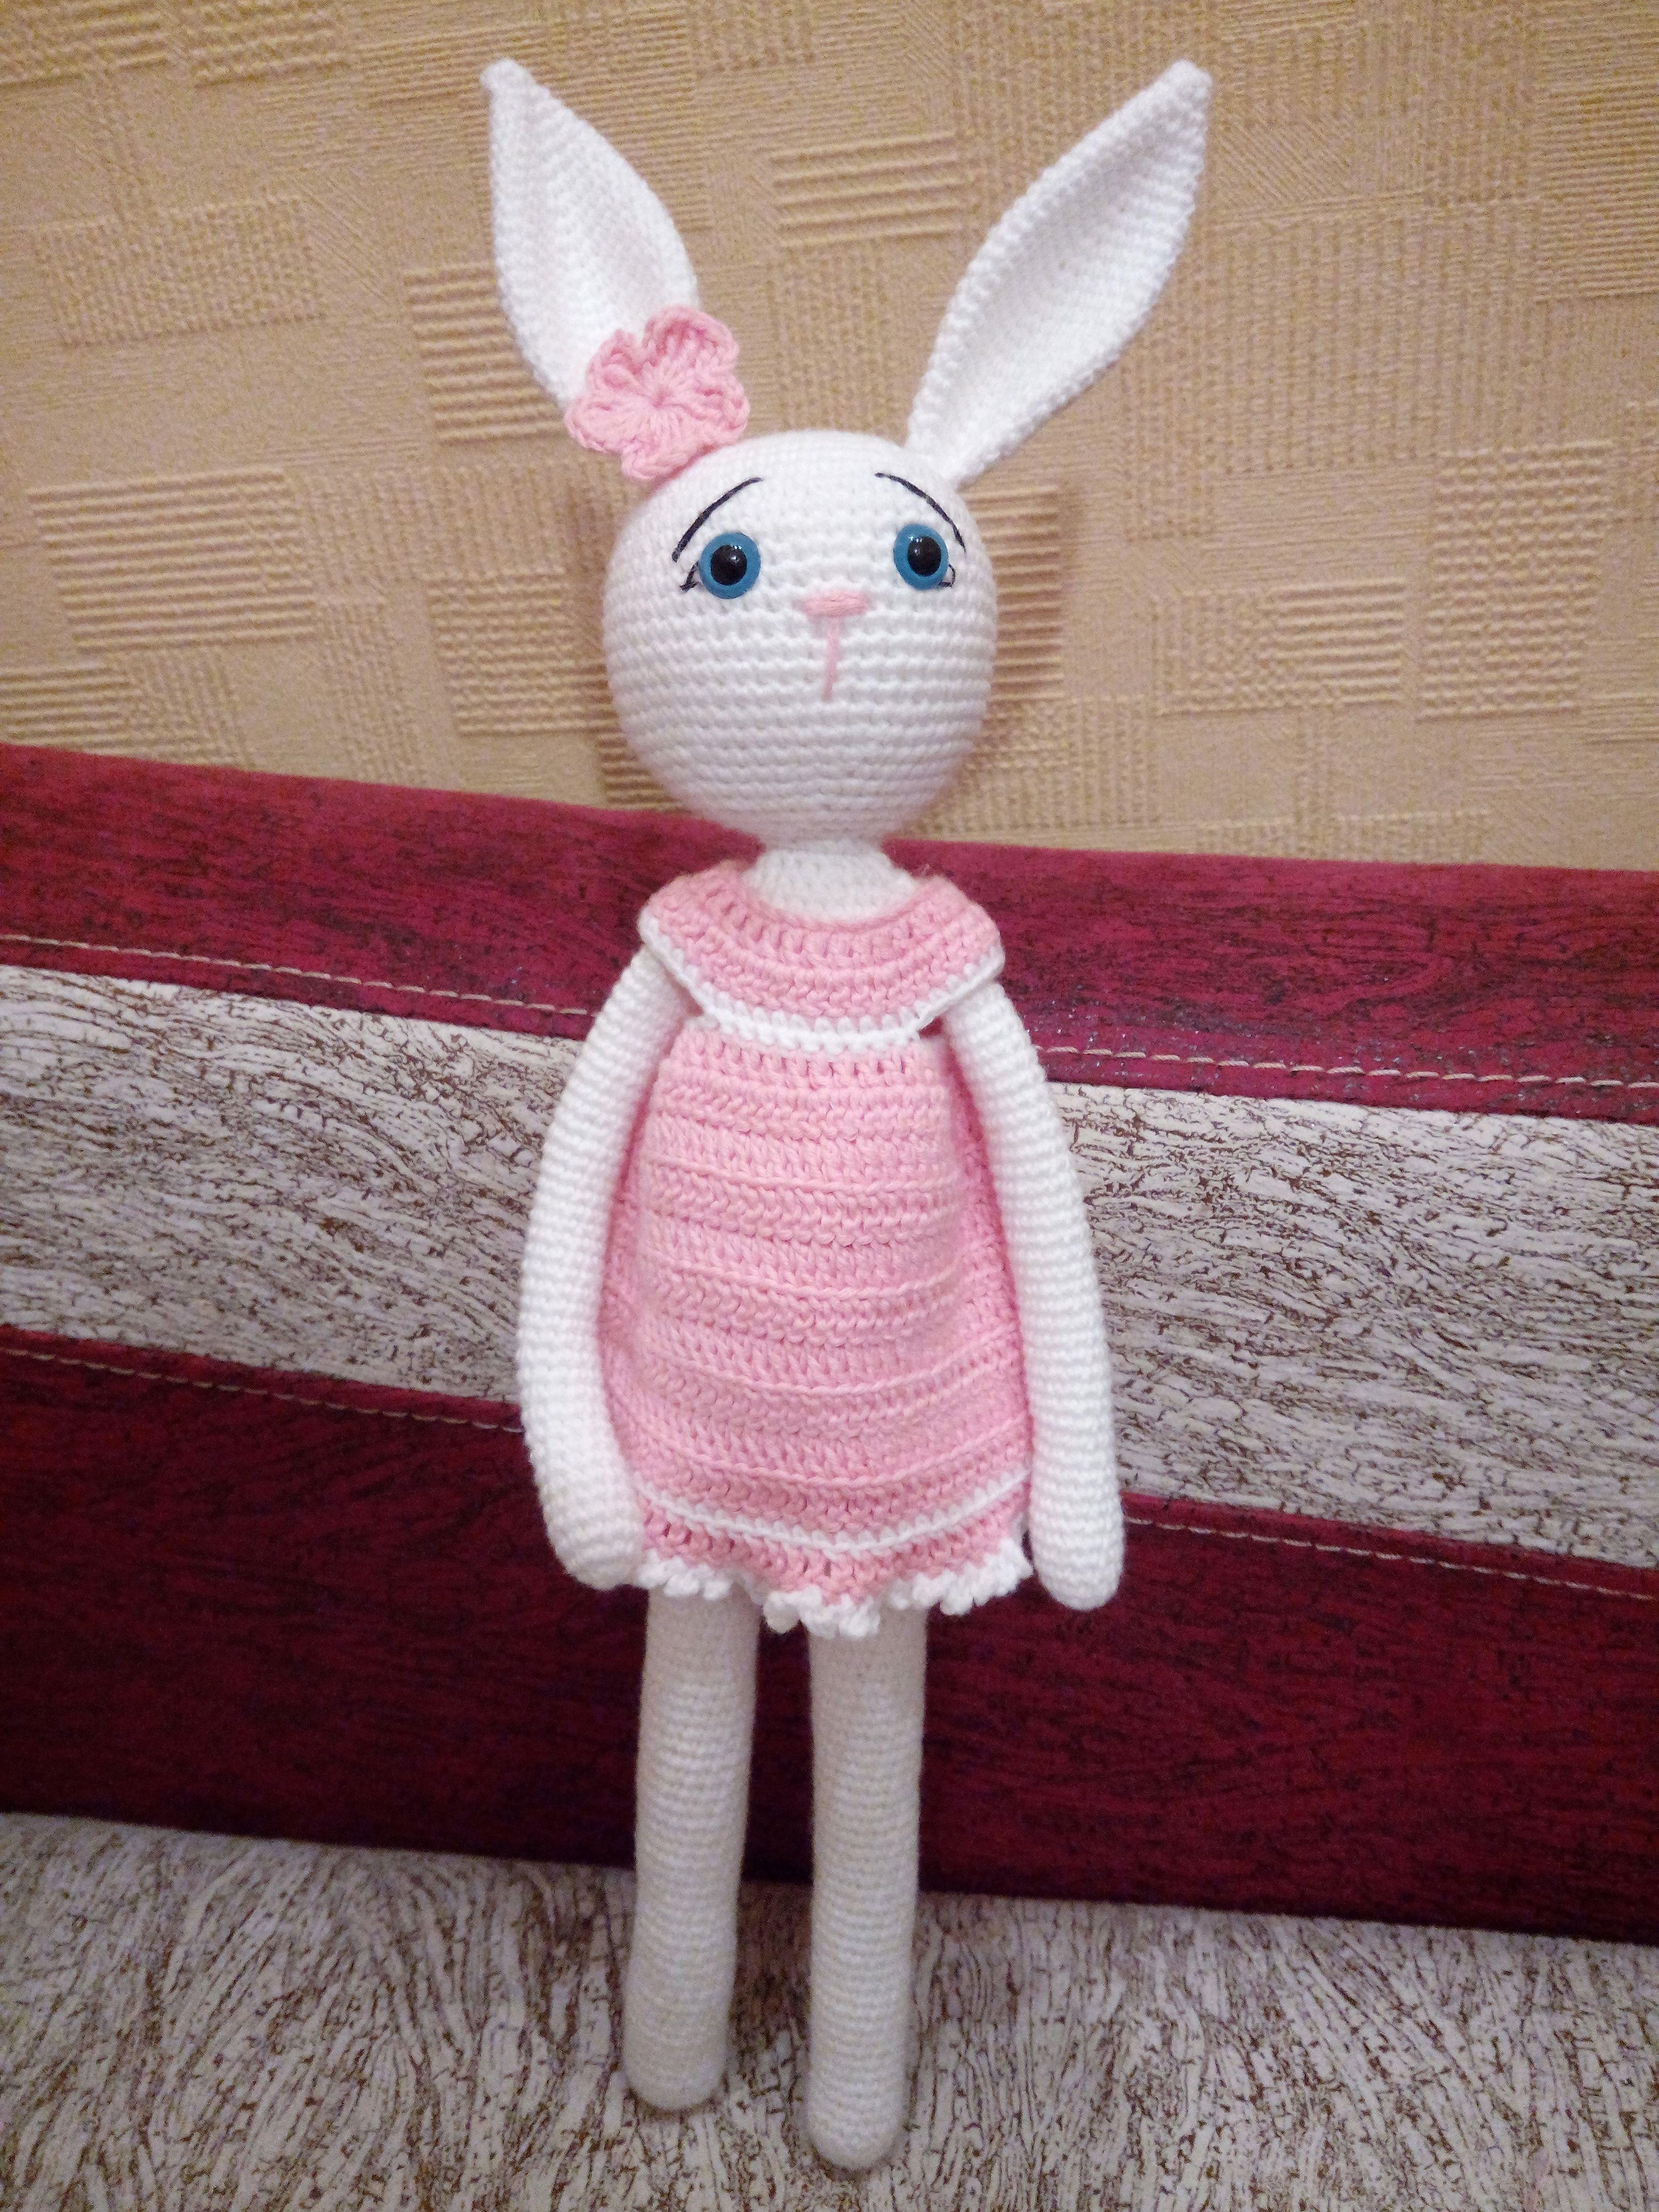 30*16*8CM Crochet Pattern Handmade Toy Cute Rabbit Amigurumi ... | 4160x3120